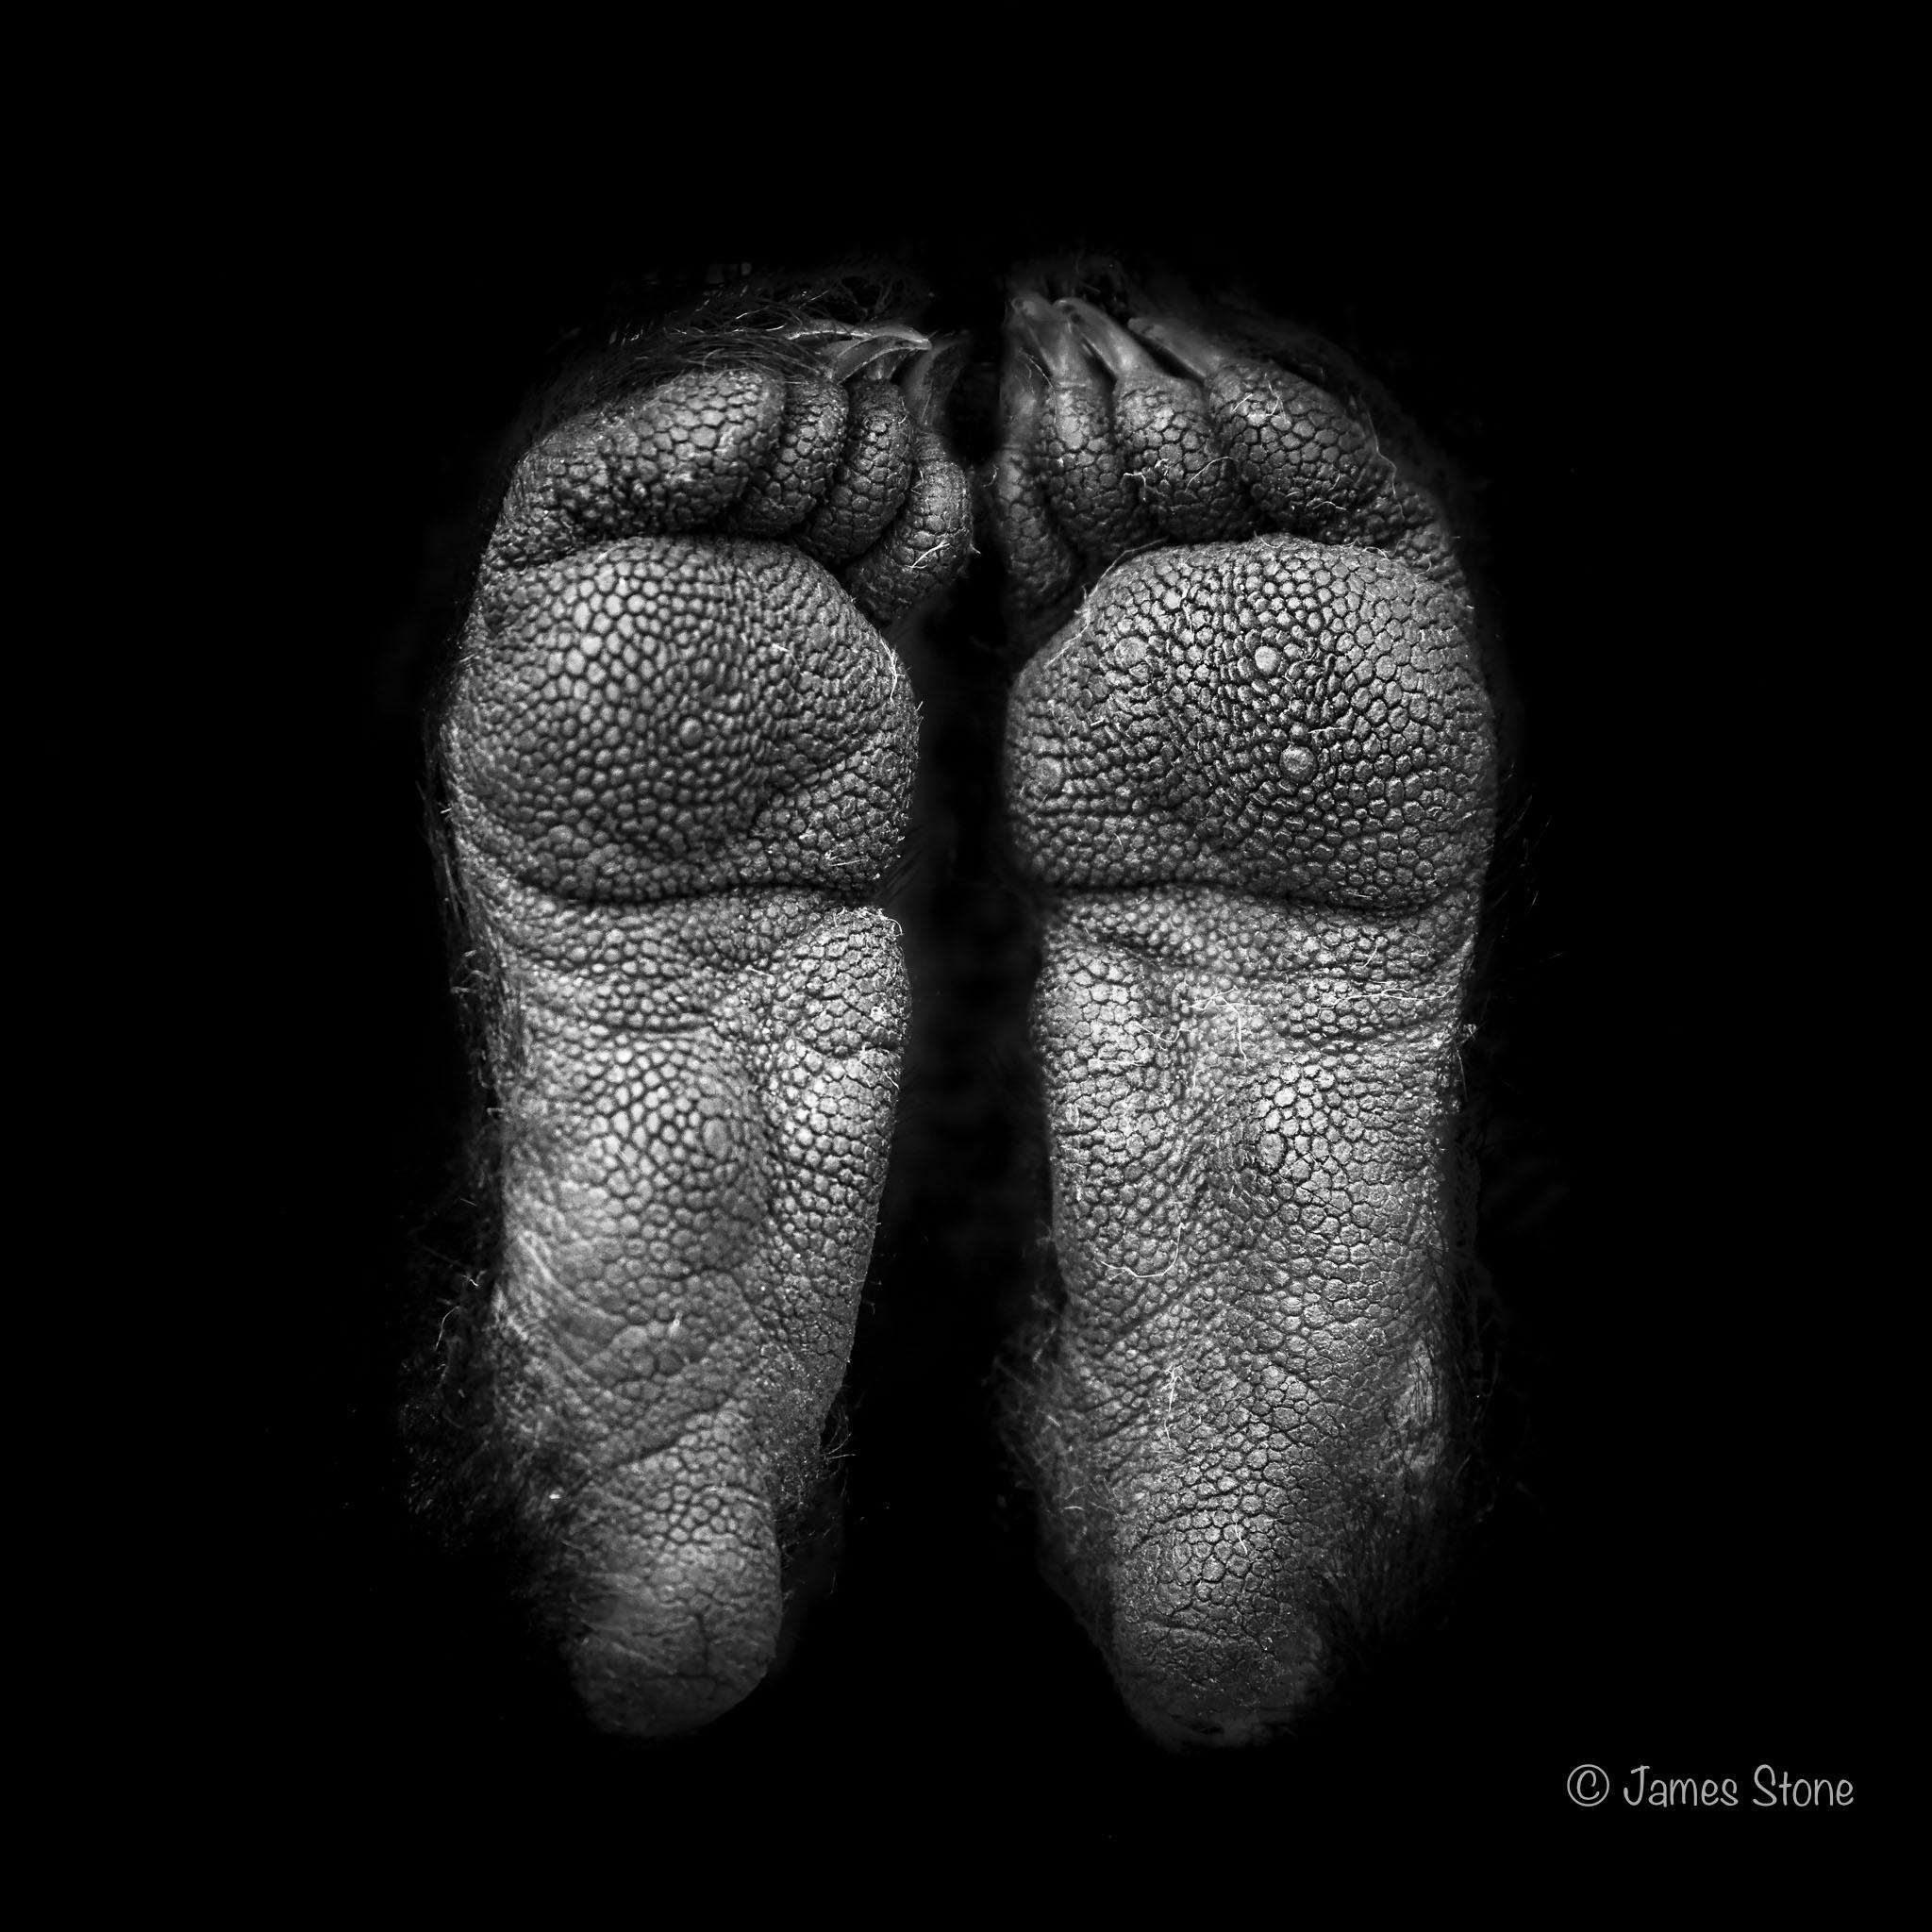 Devil's feet